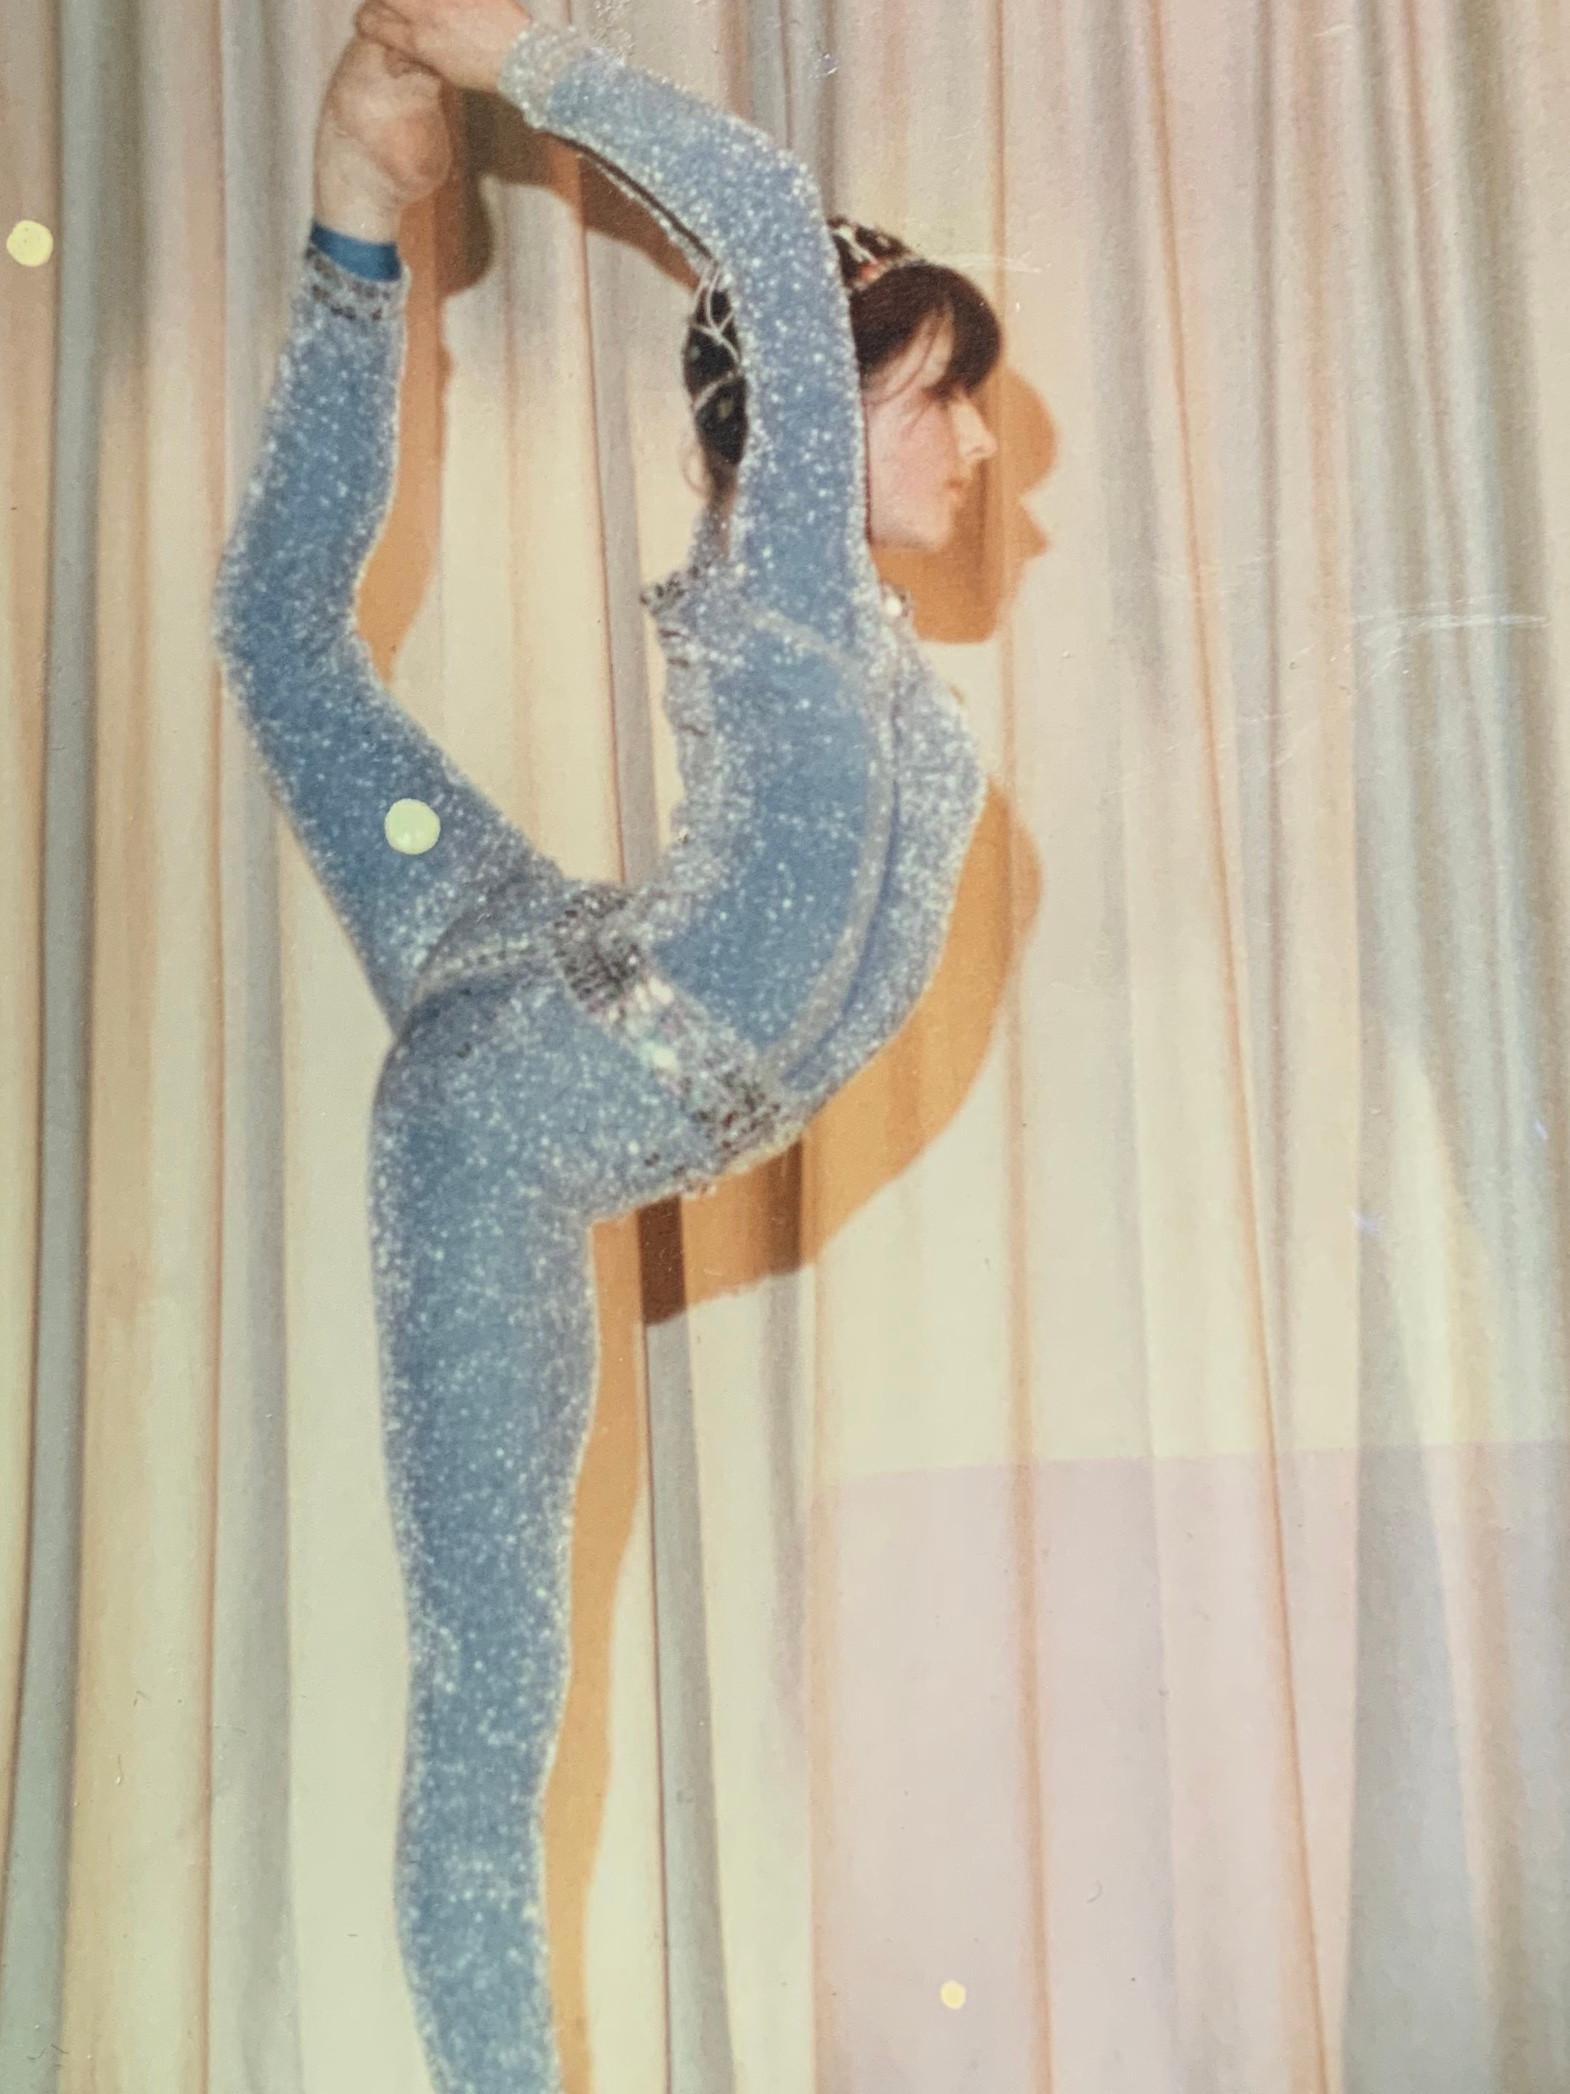 'Natarajasana' with a little bit of glitter. C.1980